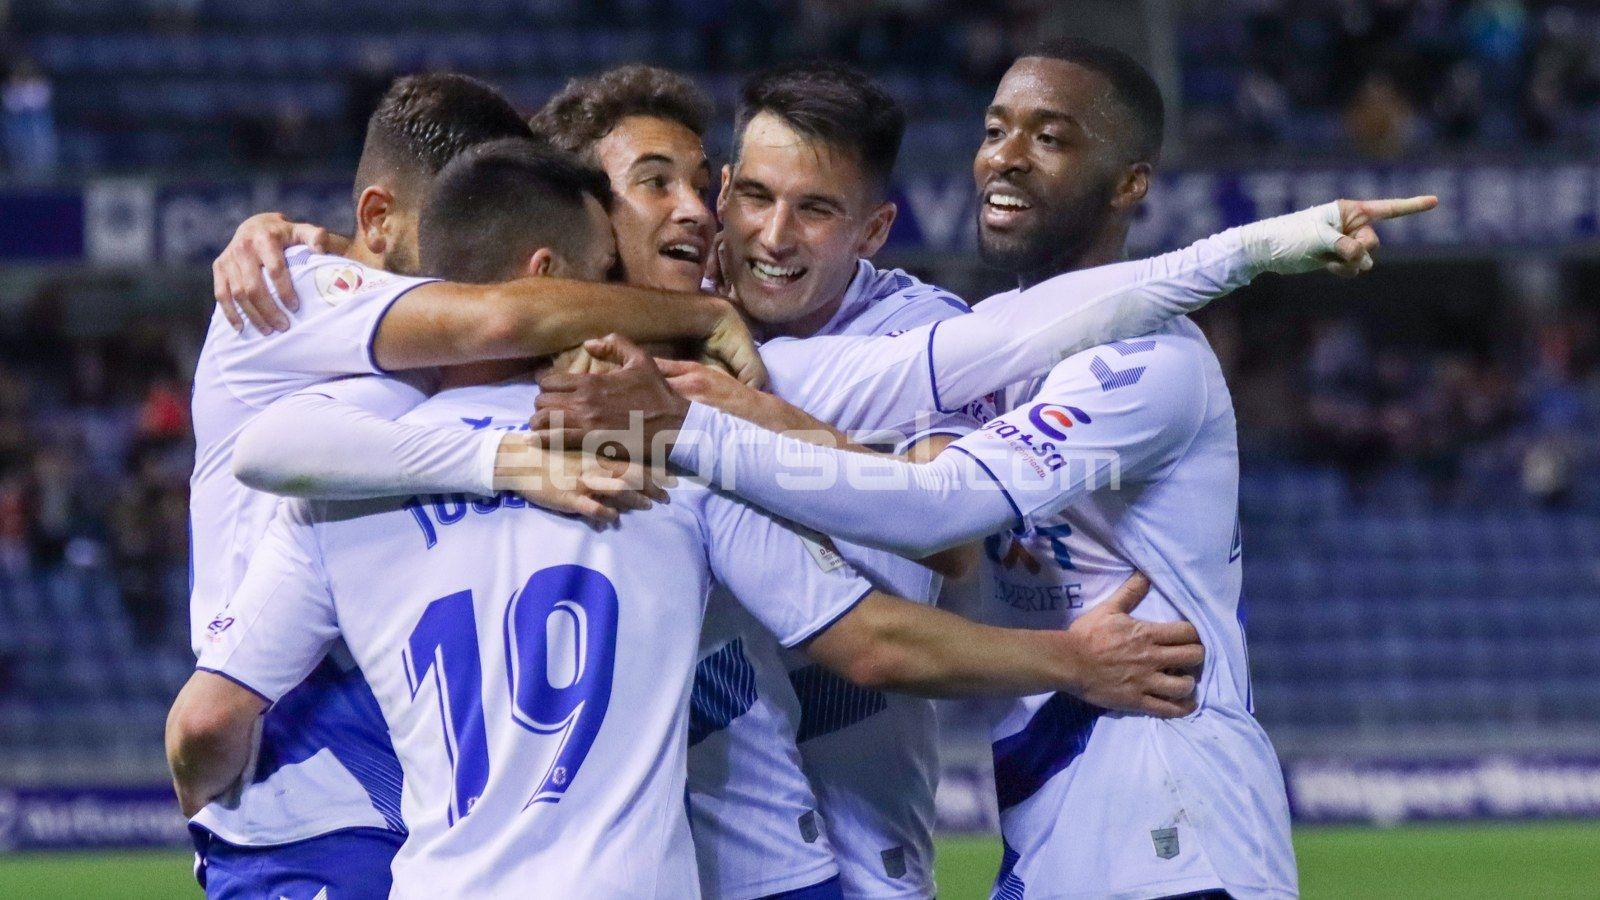 Joselu celebra con sus compañeros su estreno goleador |@jacfotografo